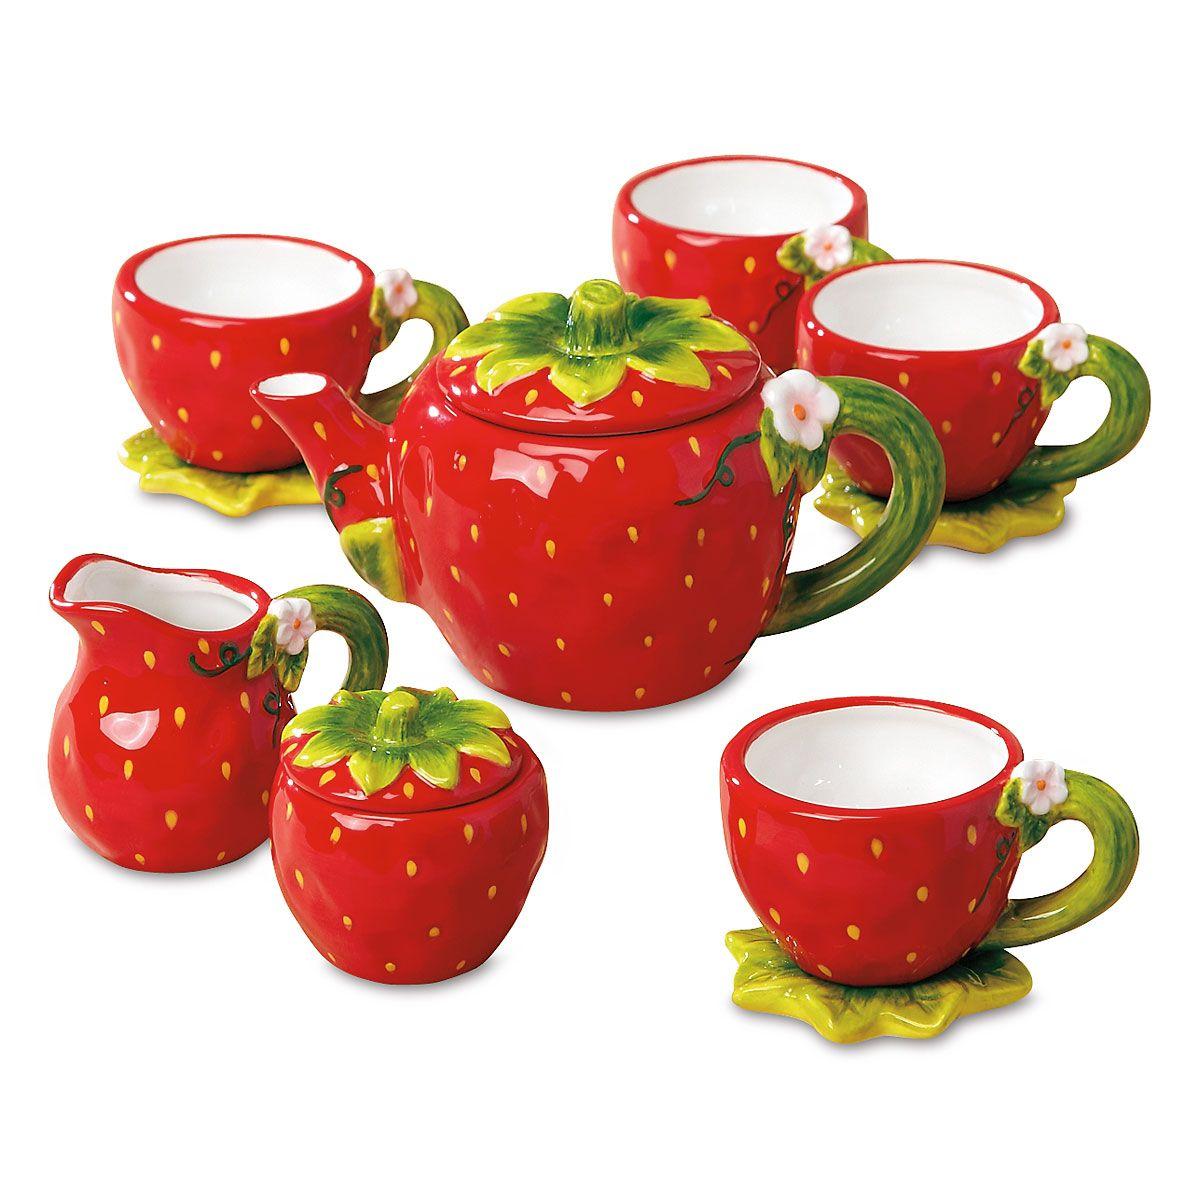 Strawberry Tea Set Colorful Images